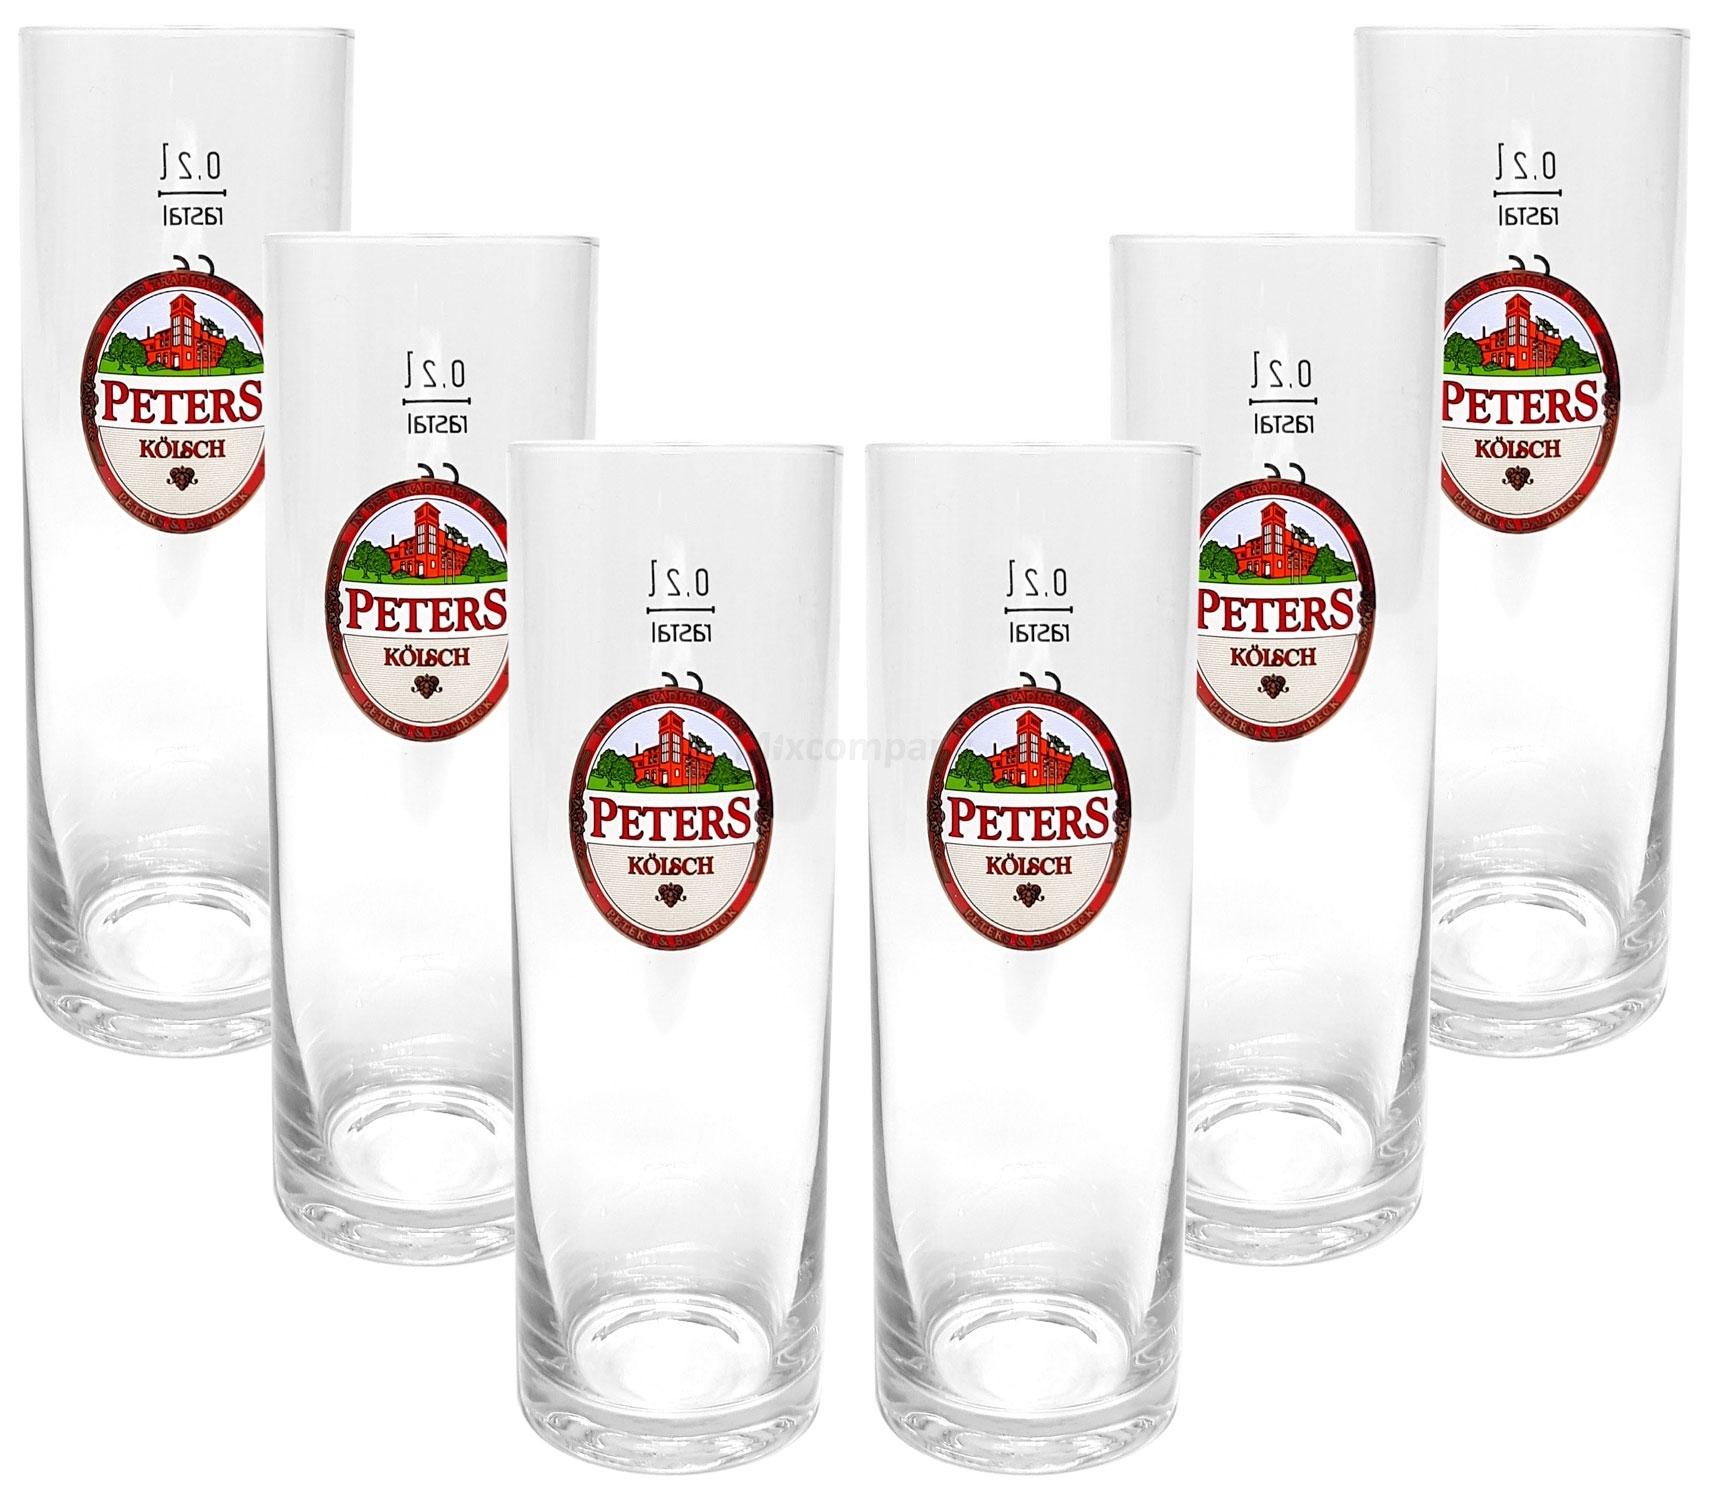 Peters Kölsch Stangen Bierglas Glas Gläser-Set - 6x Stangen 0,2l